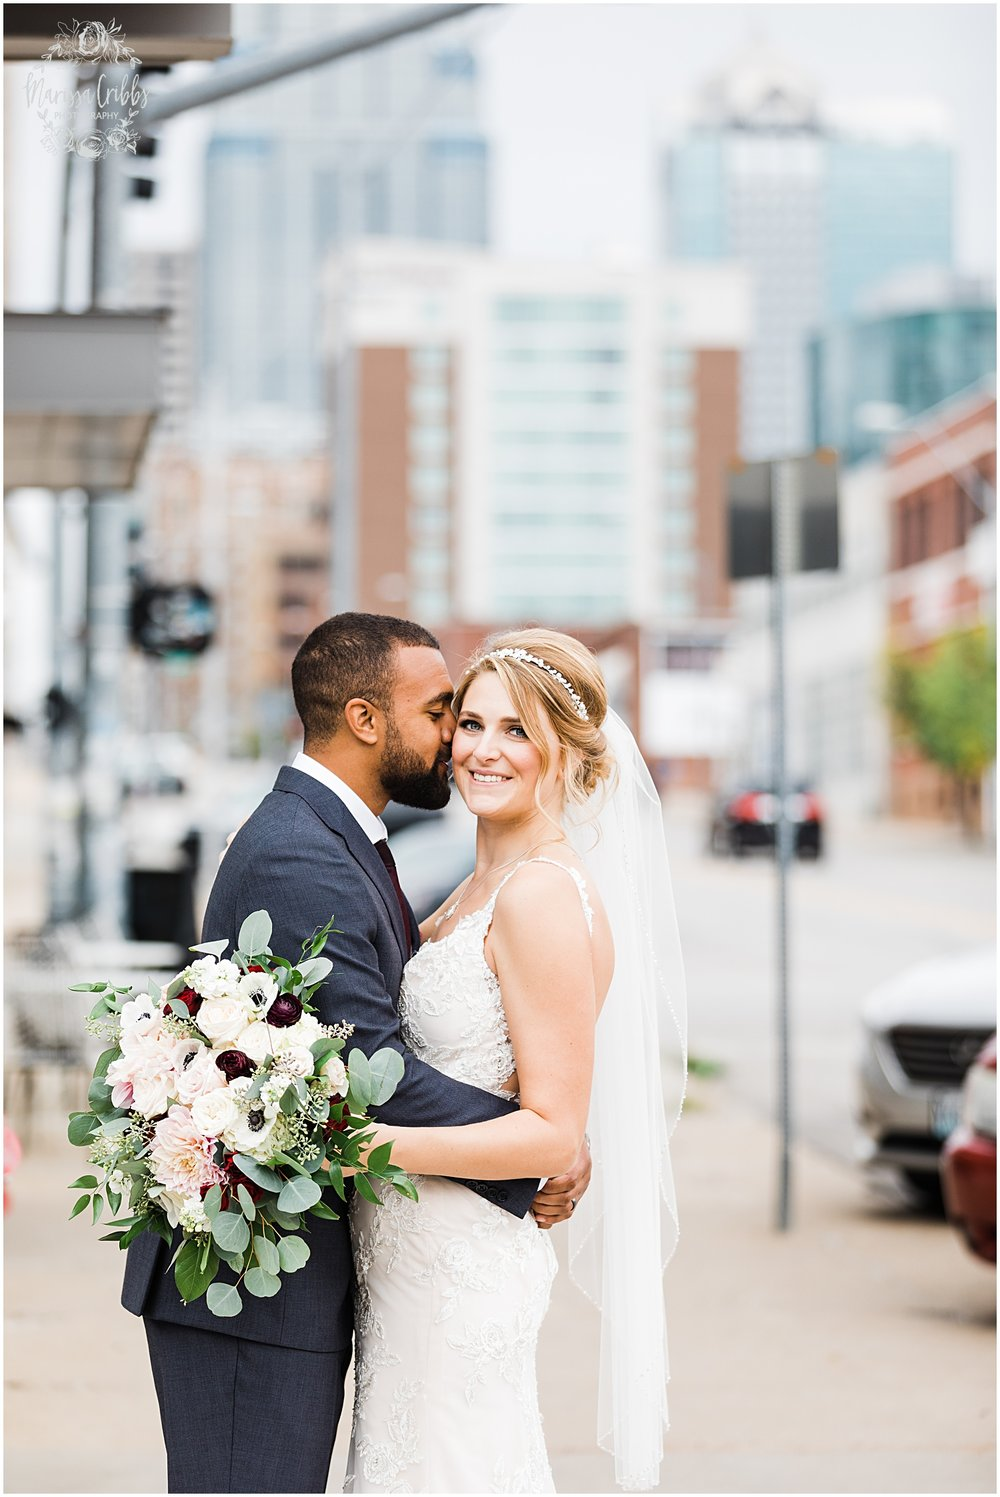 BAUER WEDDING   KELSEA & JUSTIN   MARISSA CRIBBS PHOTOGRAPHY_6530.jpg